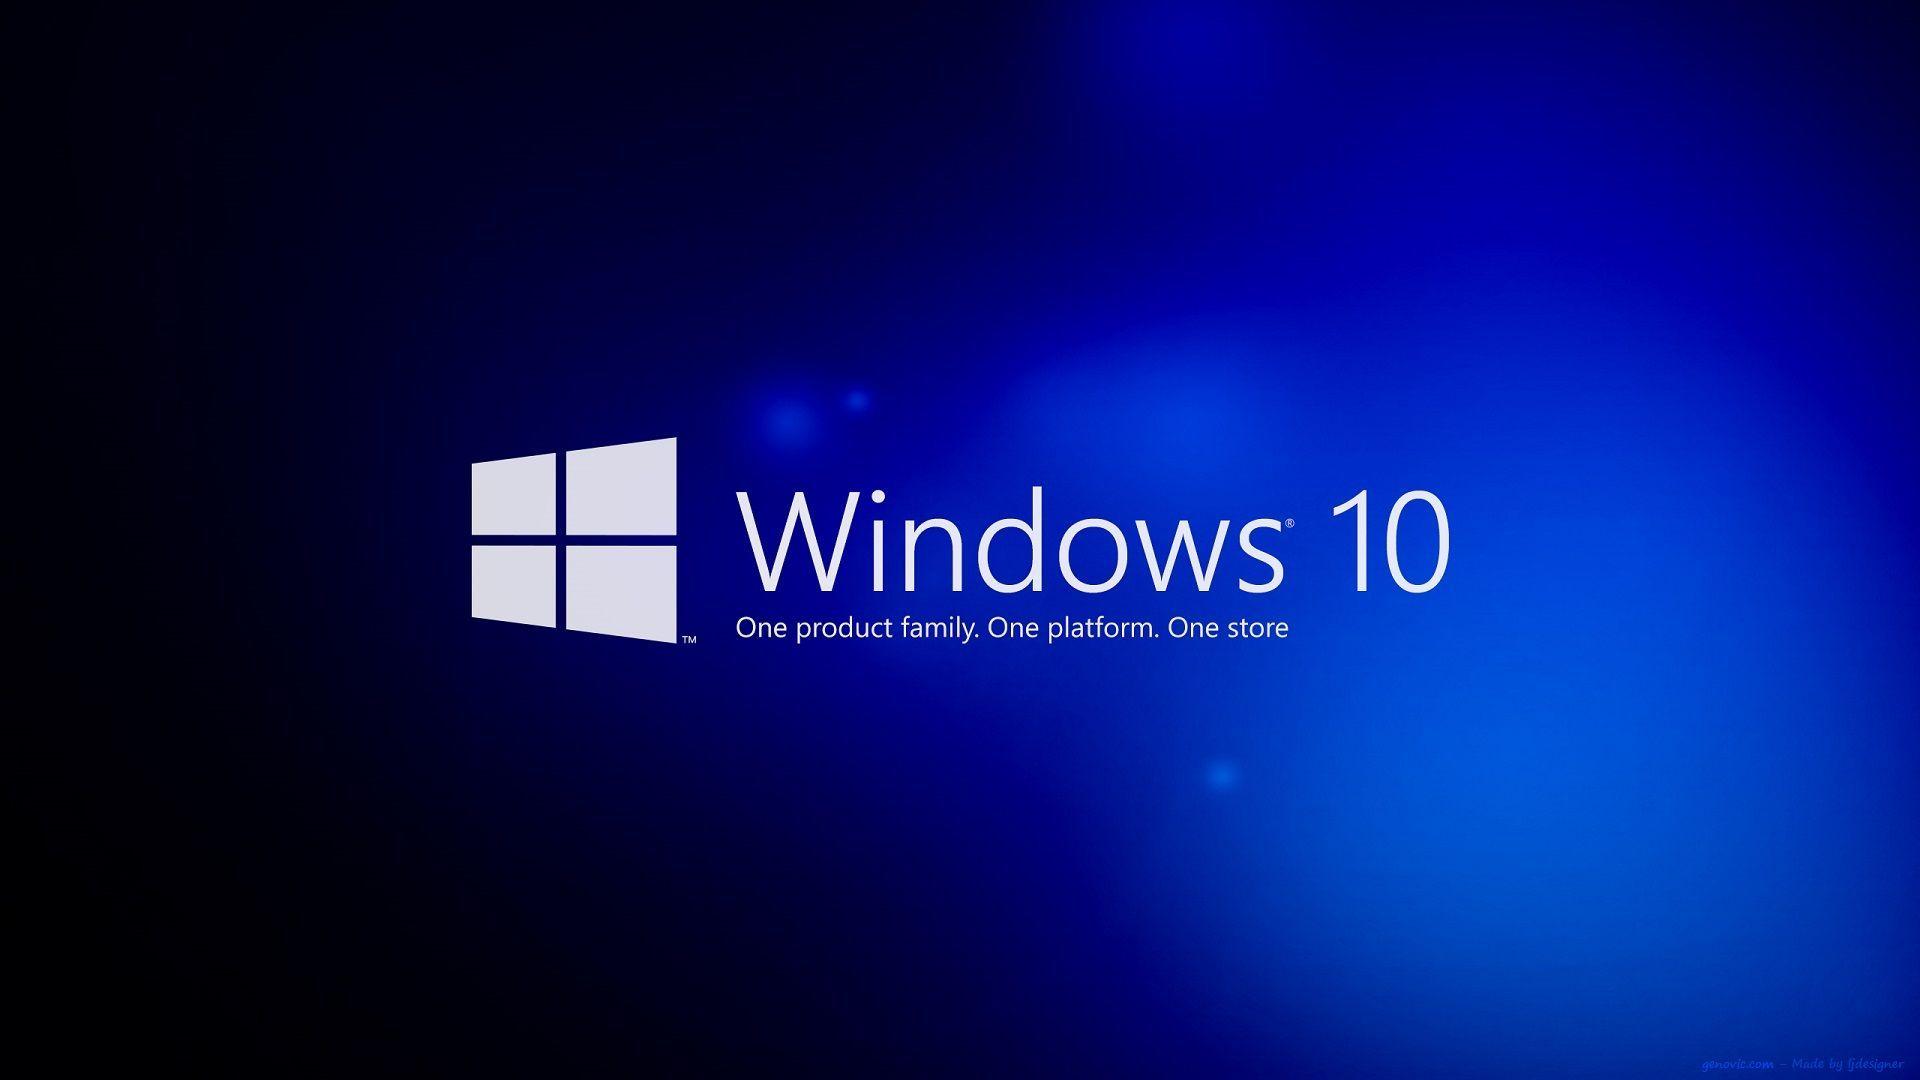 Windows10 Wallpaper Windows 10 Microsoft Wallpaper Cool Desktop Backgrounds